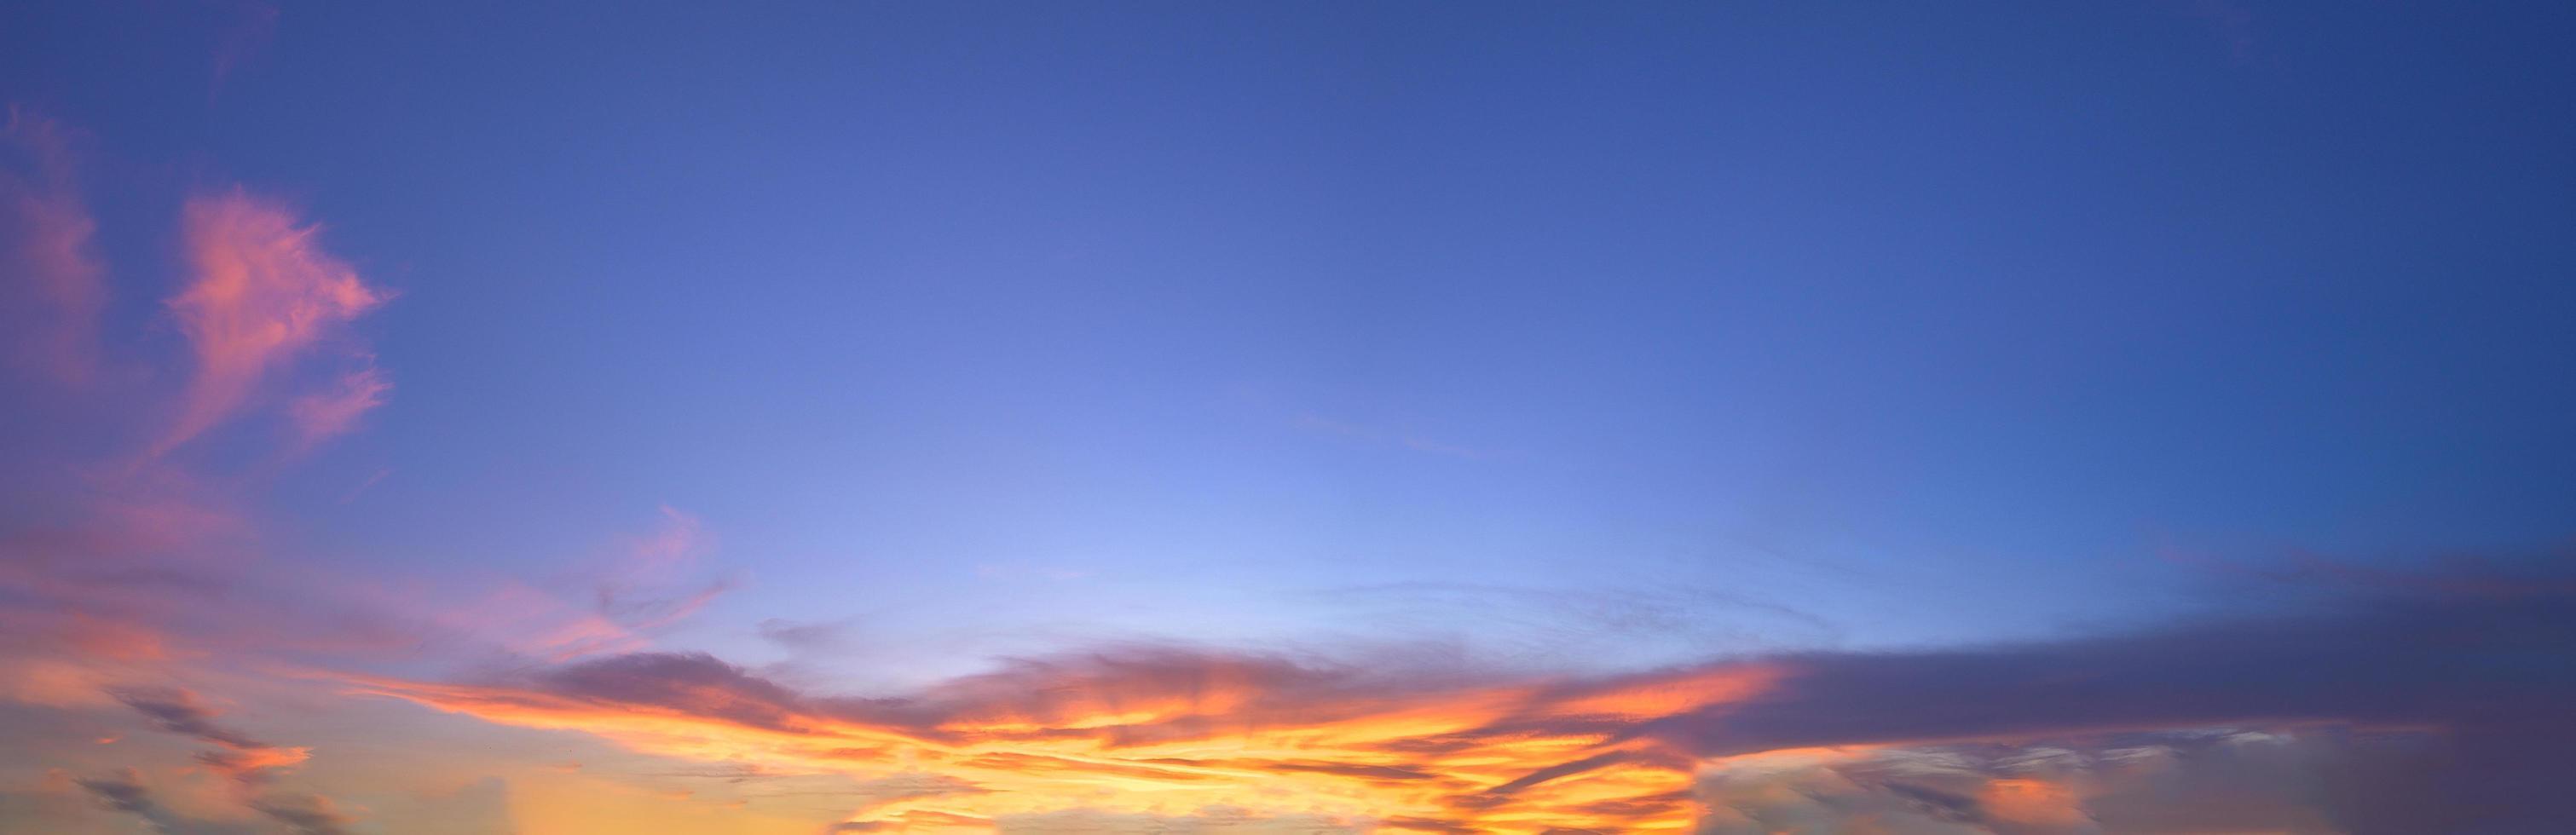 cielo al tramonto e nuvole la sera foto